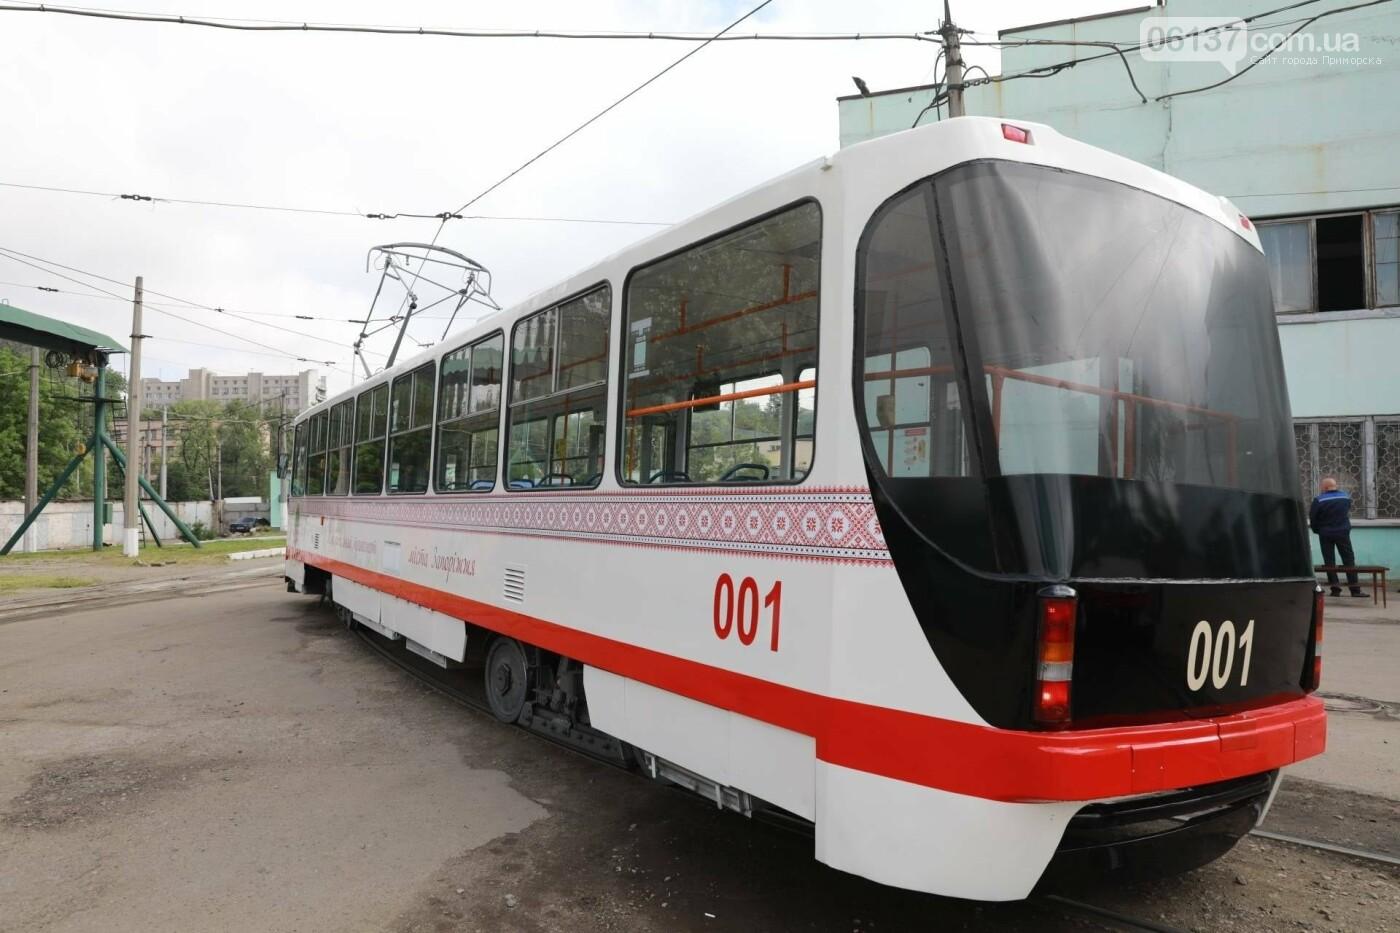 В Запорожье запустили еще один европейский трамвай. Фото, фото-3